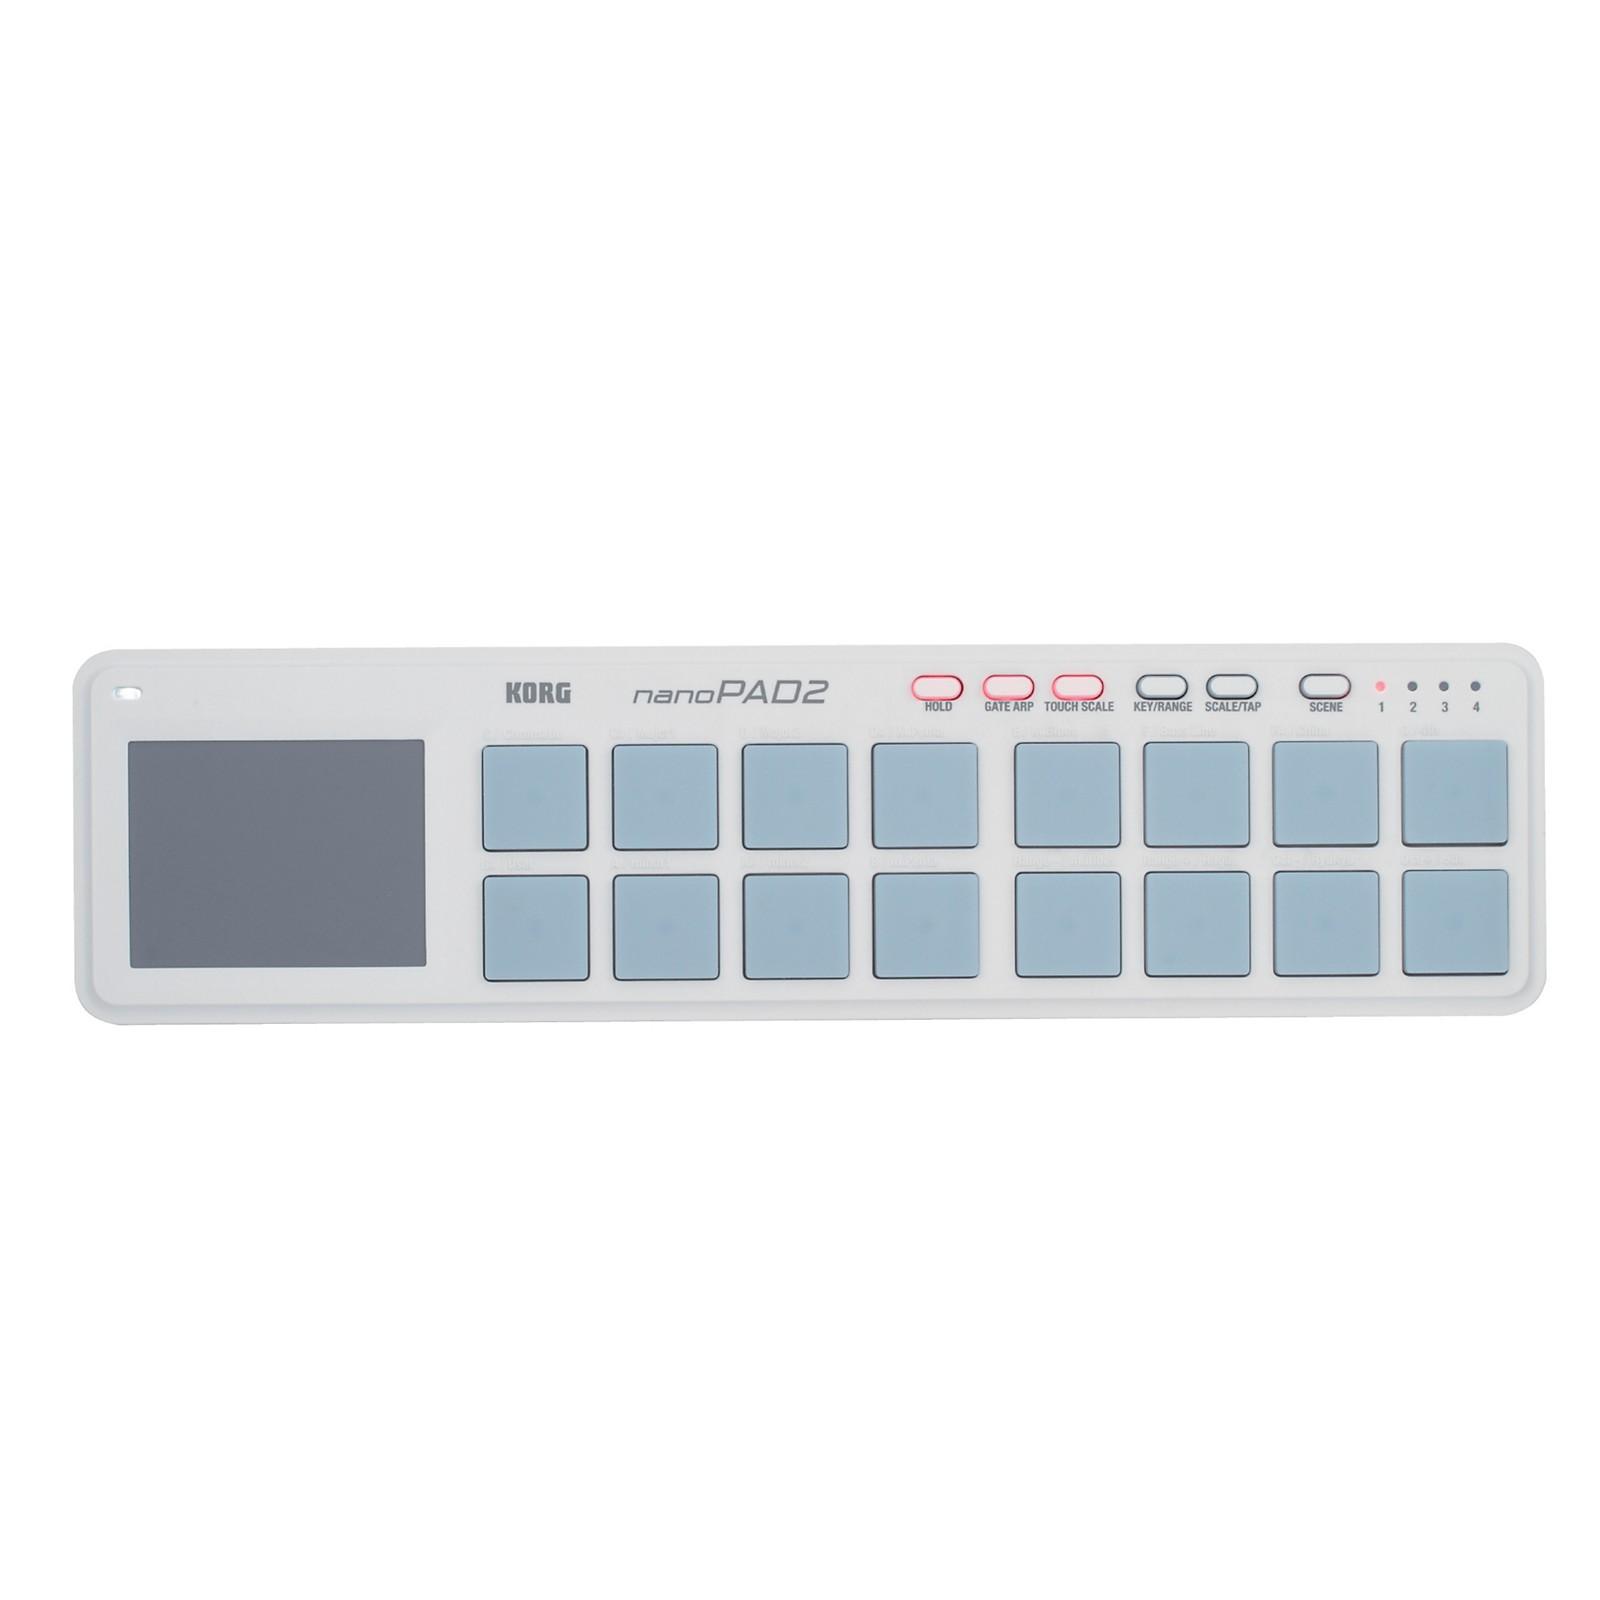 Korg NANOPAD2 USB Drum Pad Controller